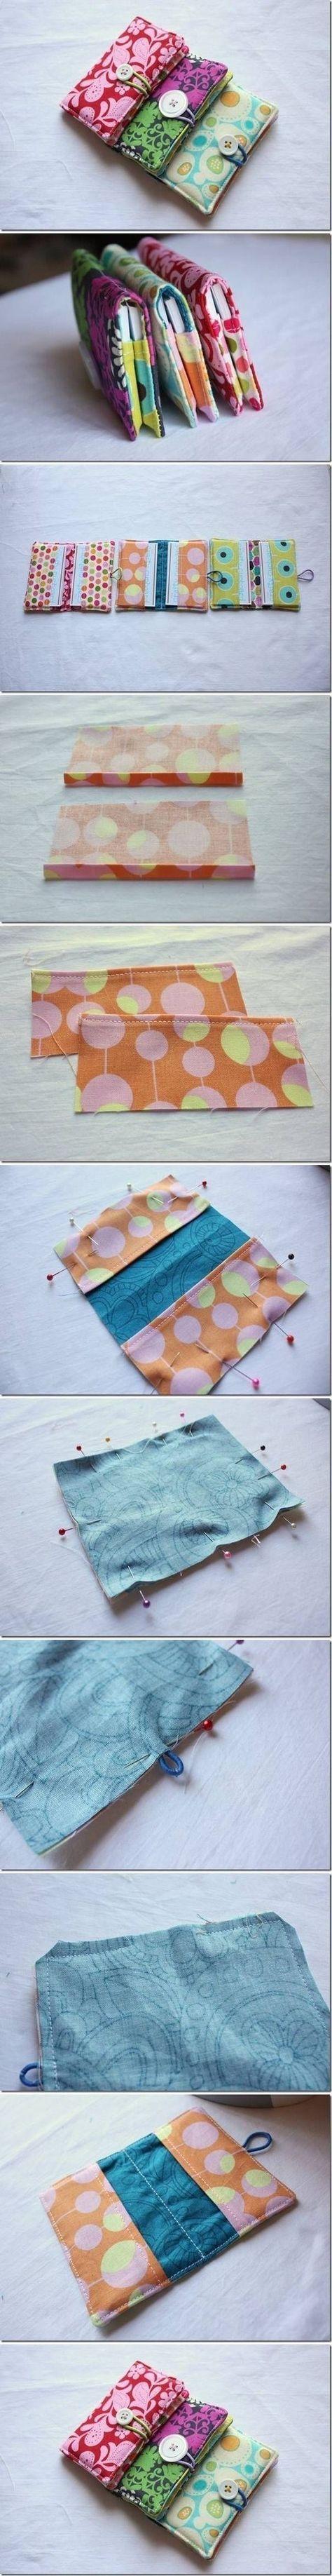 Diy Sew Business Card Holder Flowers Handbag Diy Crafts Home